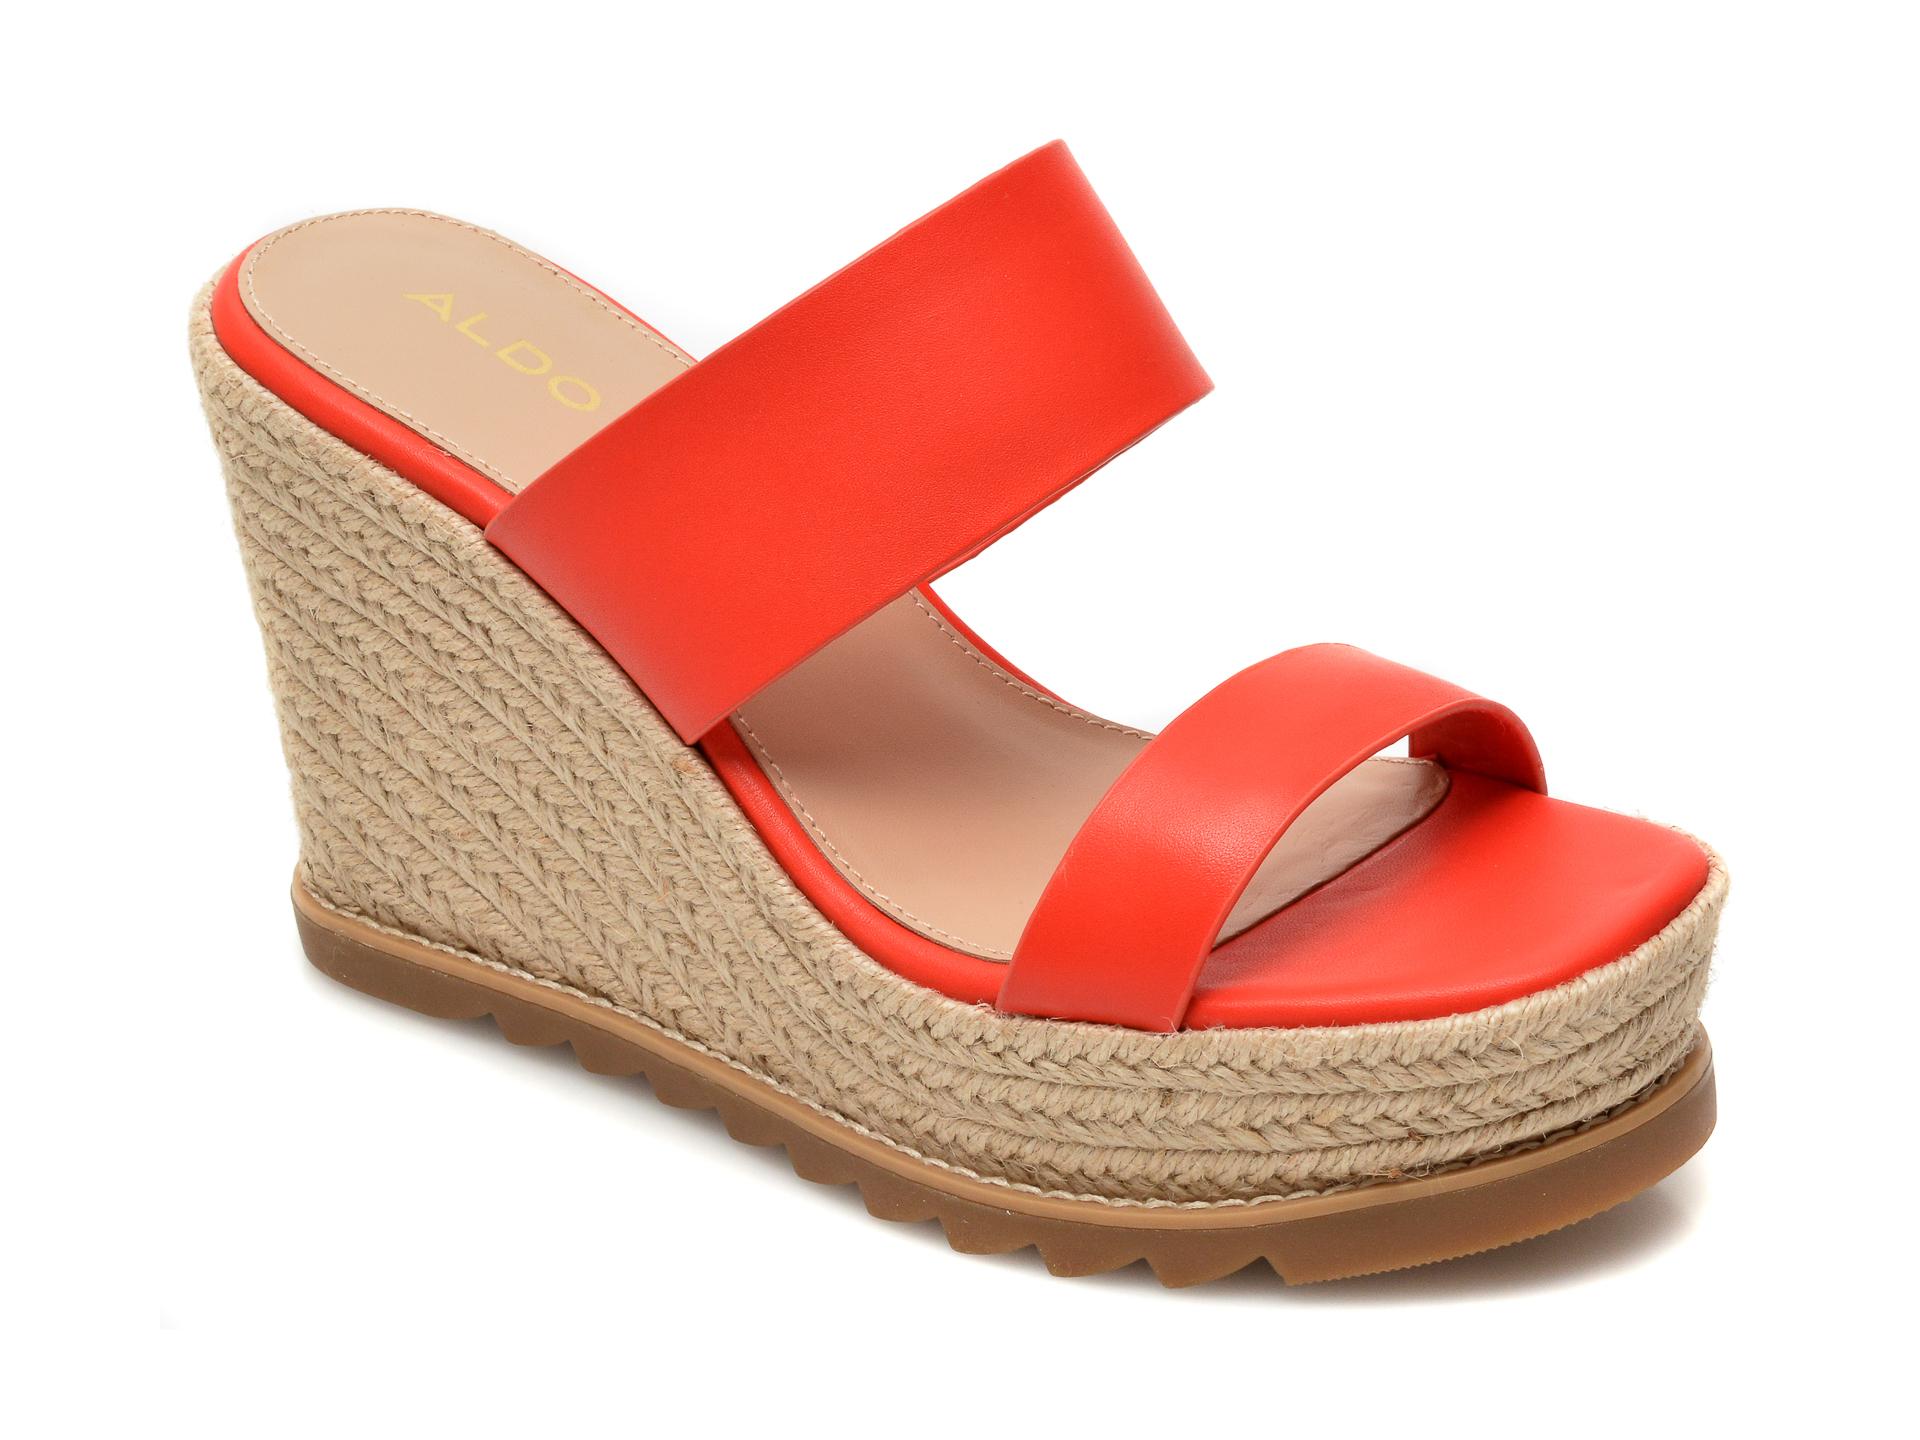 Papuci ALDO rosii, Agraerith800, din piele naturala